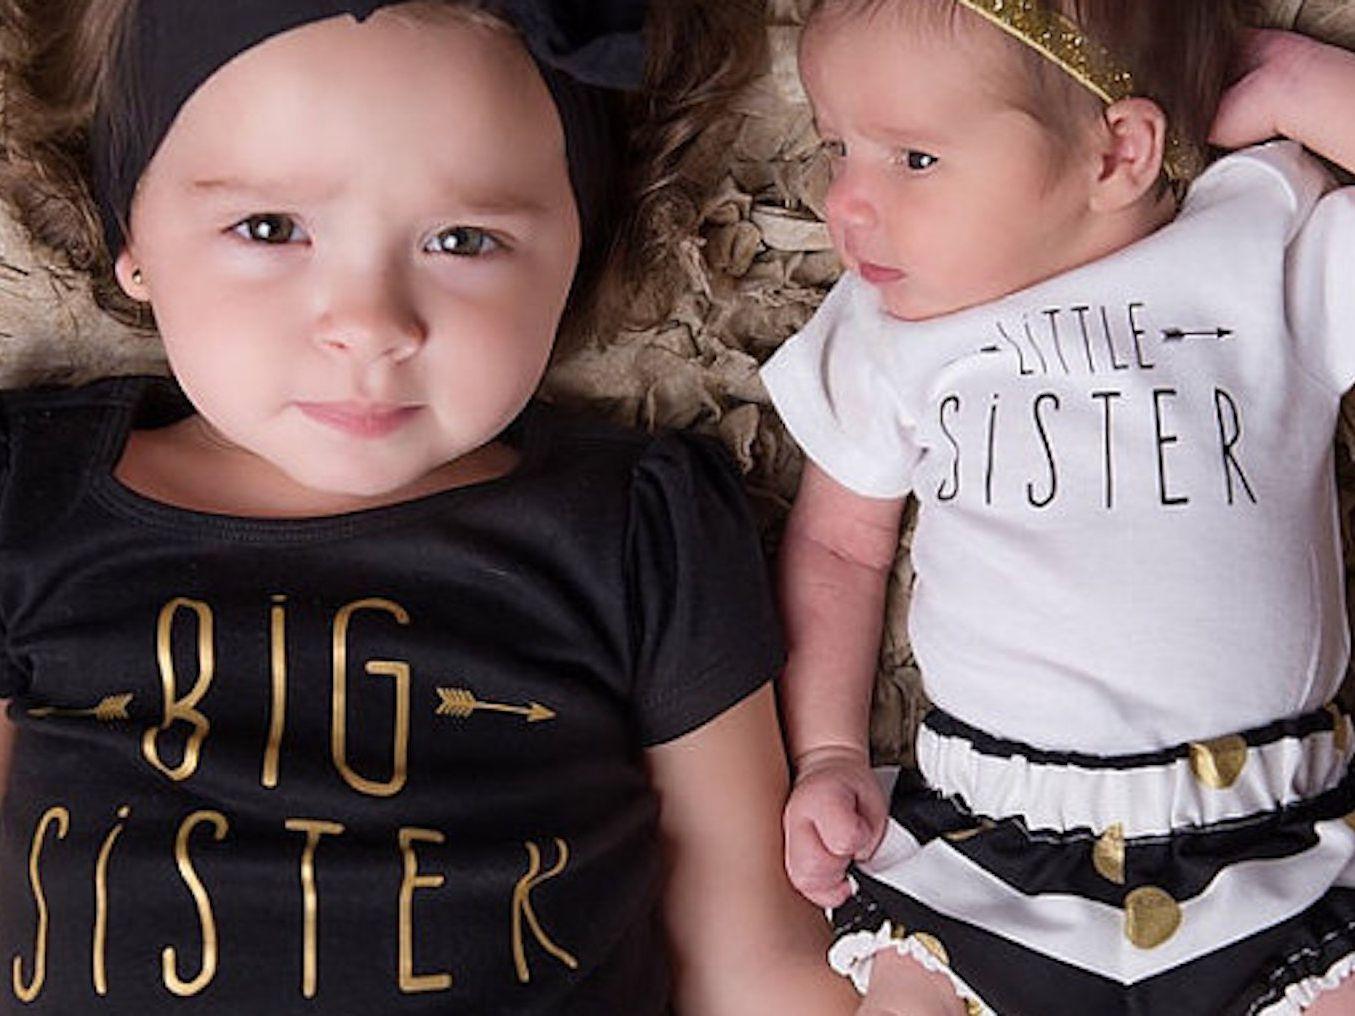 awesome big brother shirt toddler sibling tshirt brother t-shirt awesome bro